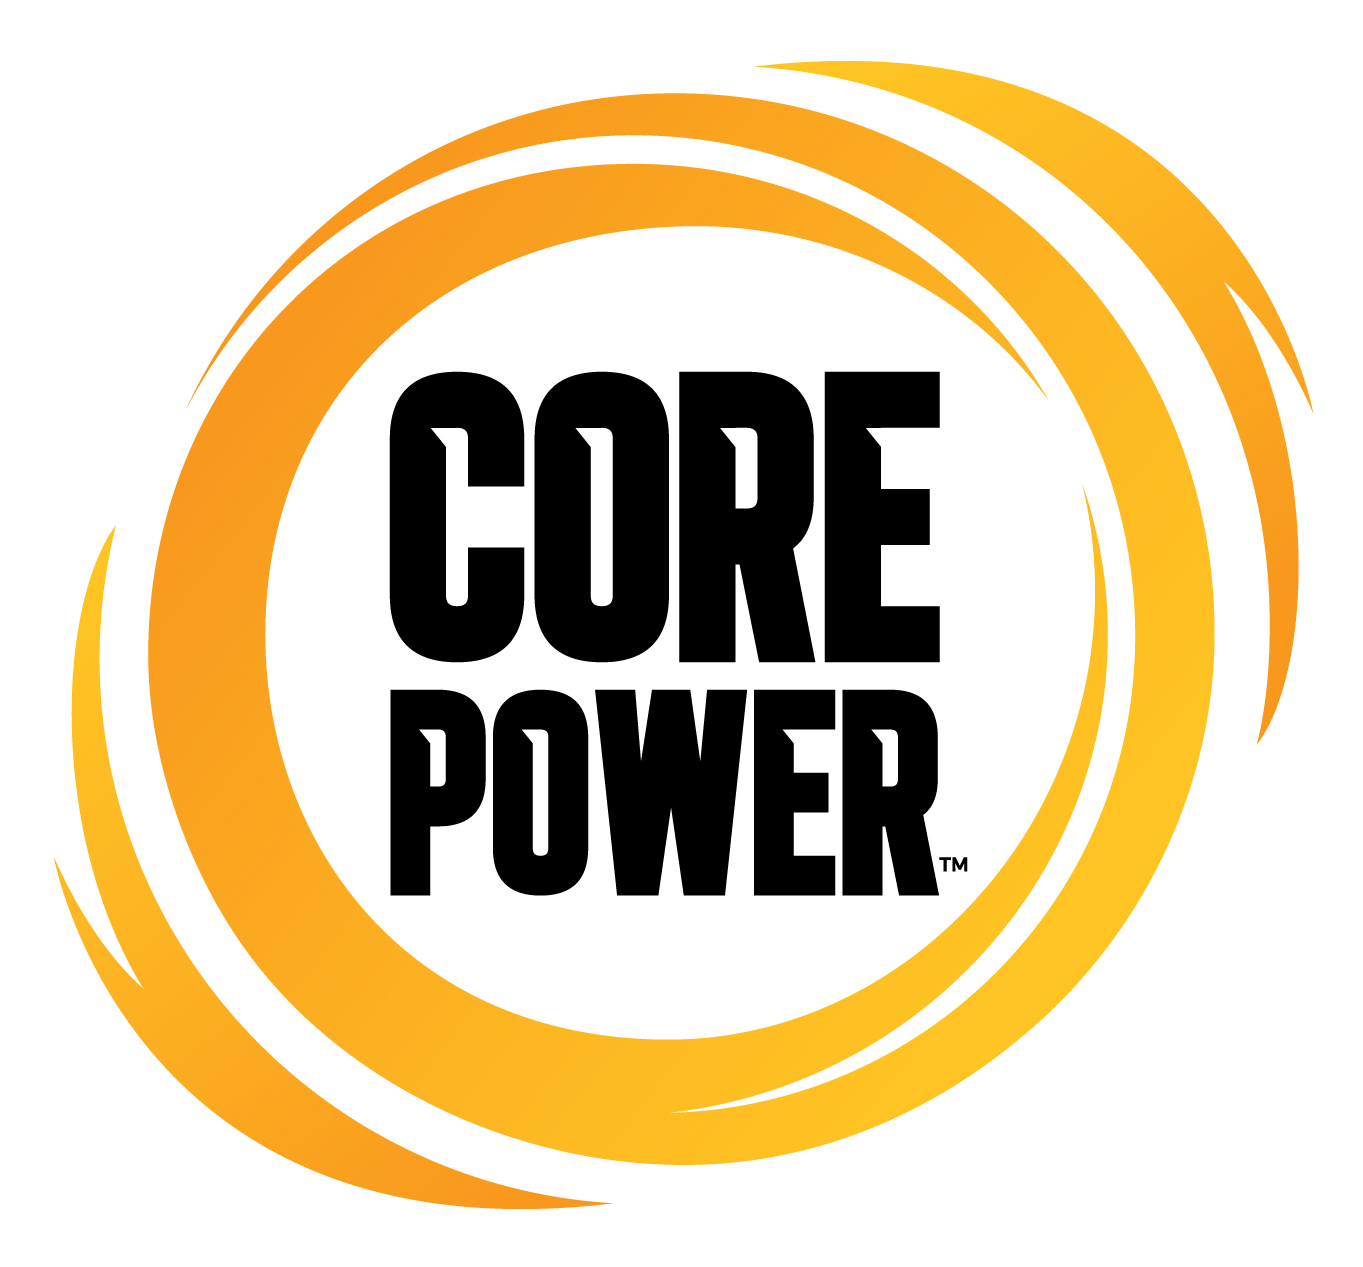 http://www.corepower.com/